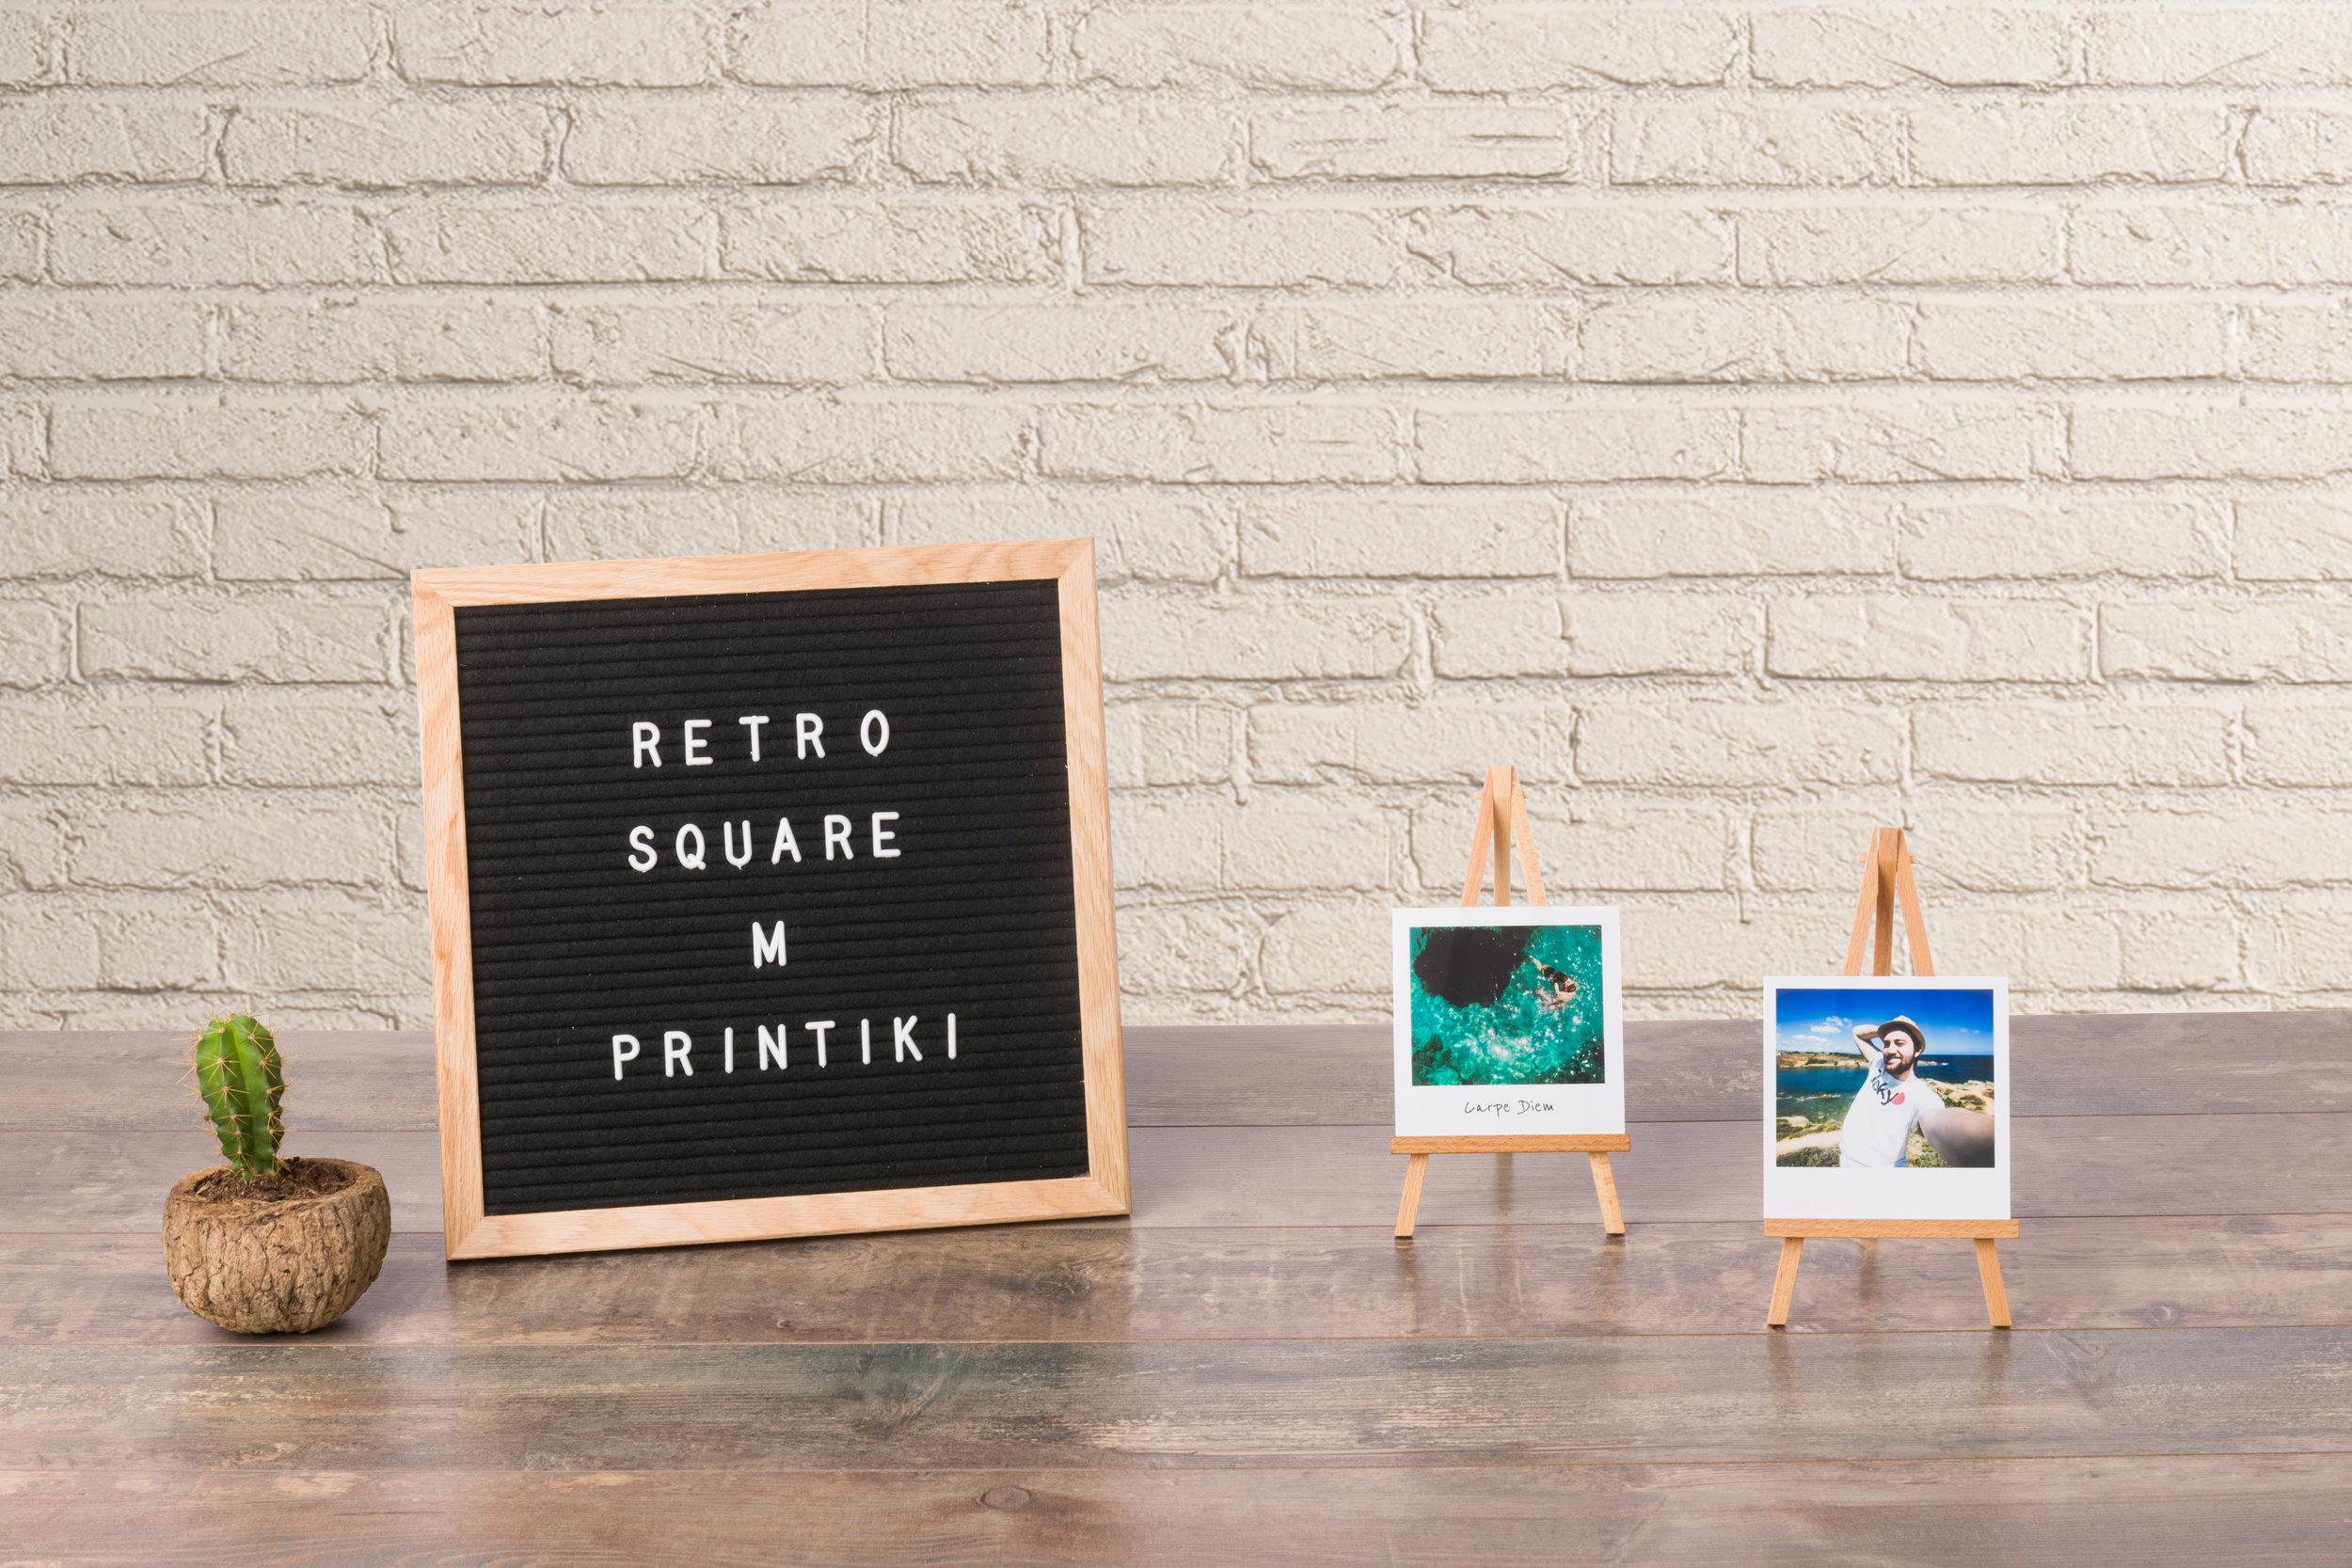 Decor-Retor-Prints-M.jpg